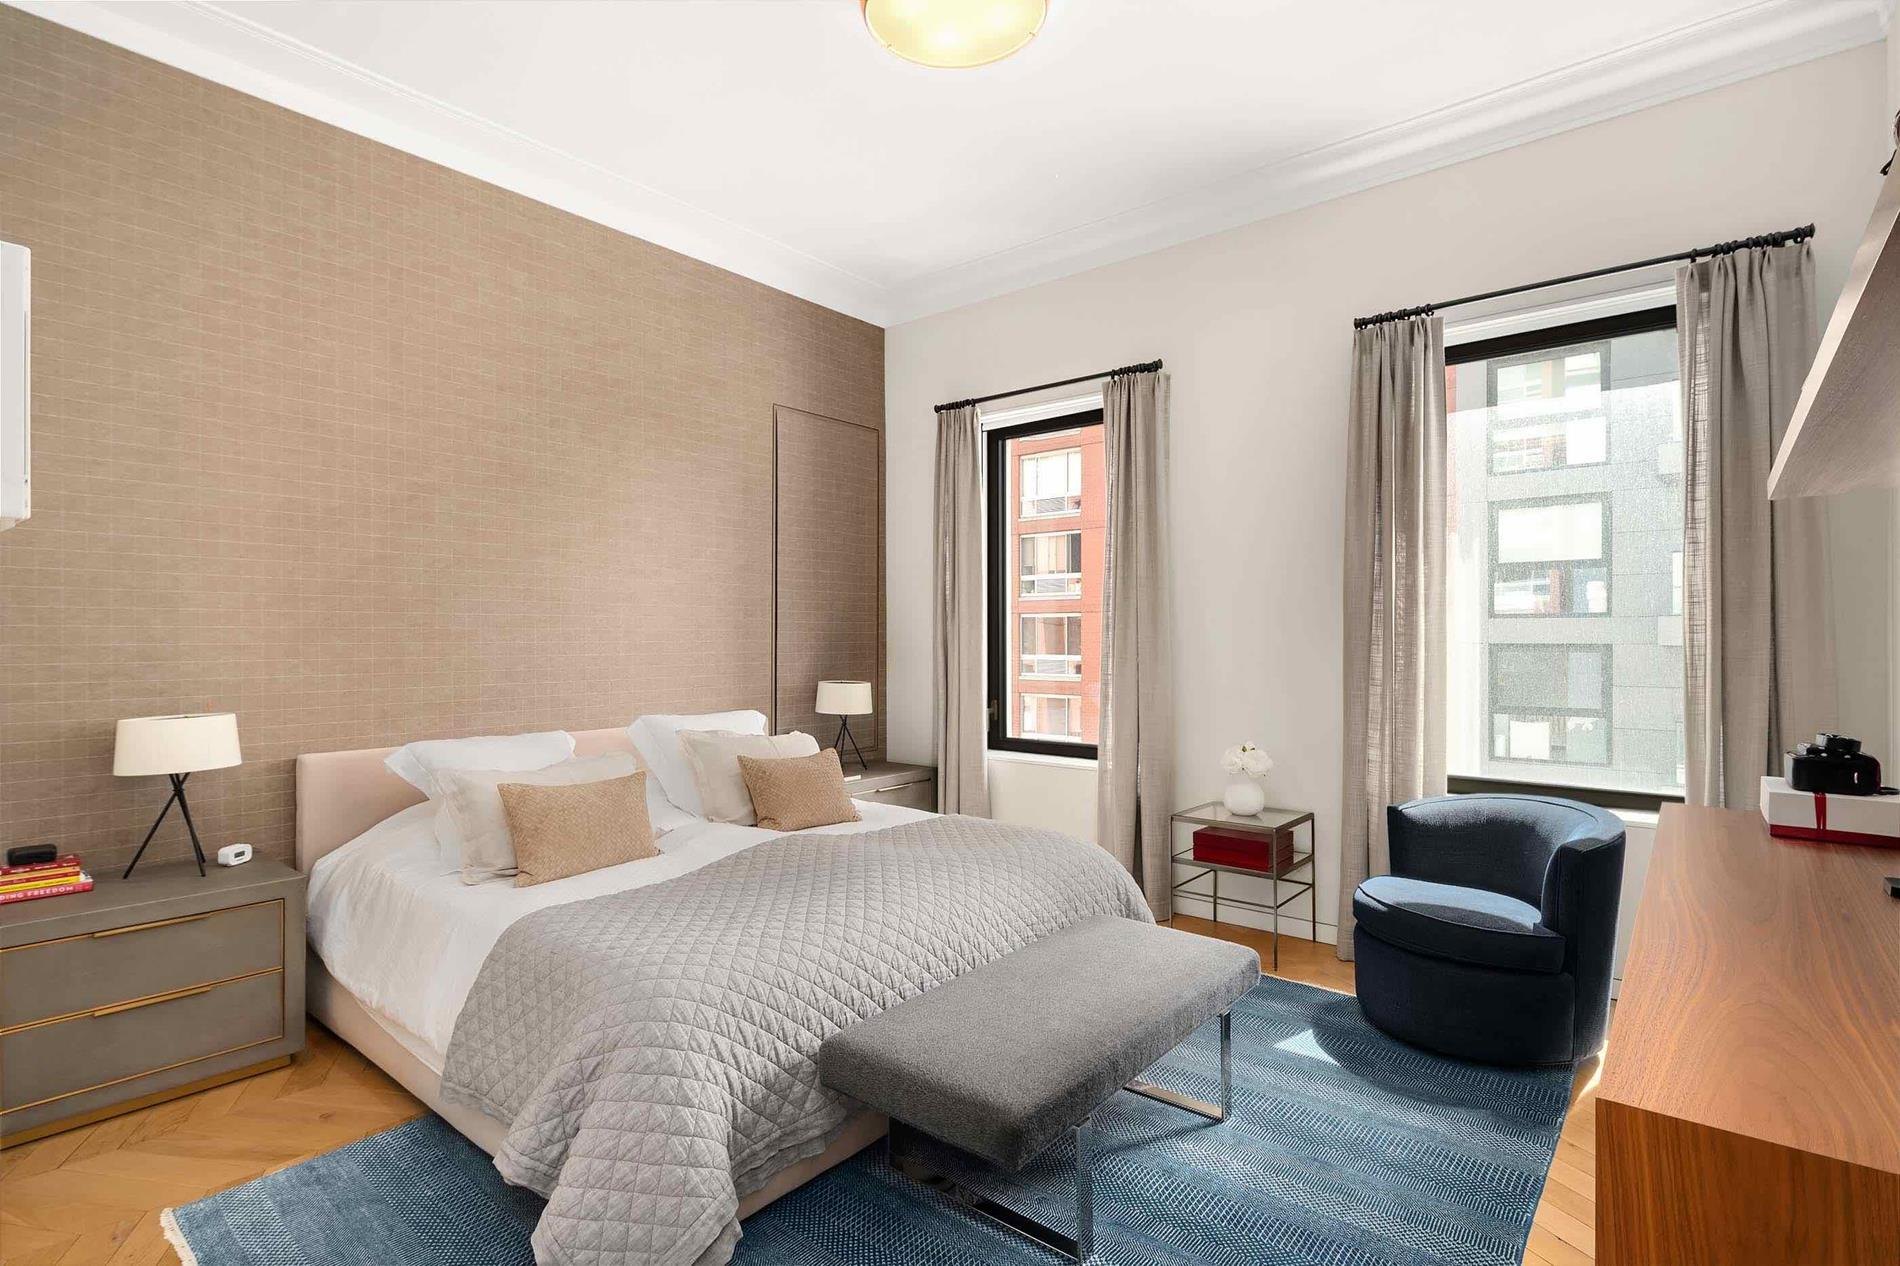 560 West 24th Street Chelsea New York NY 10011